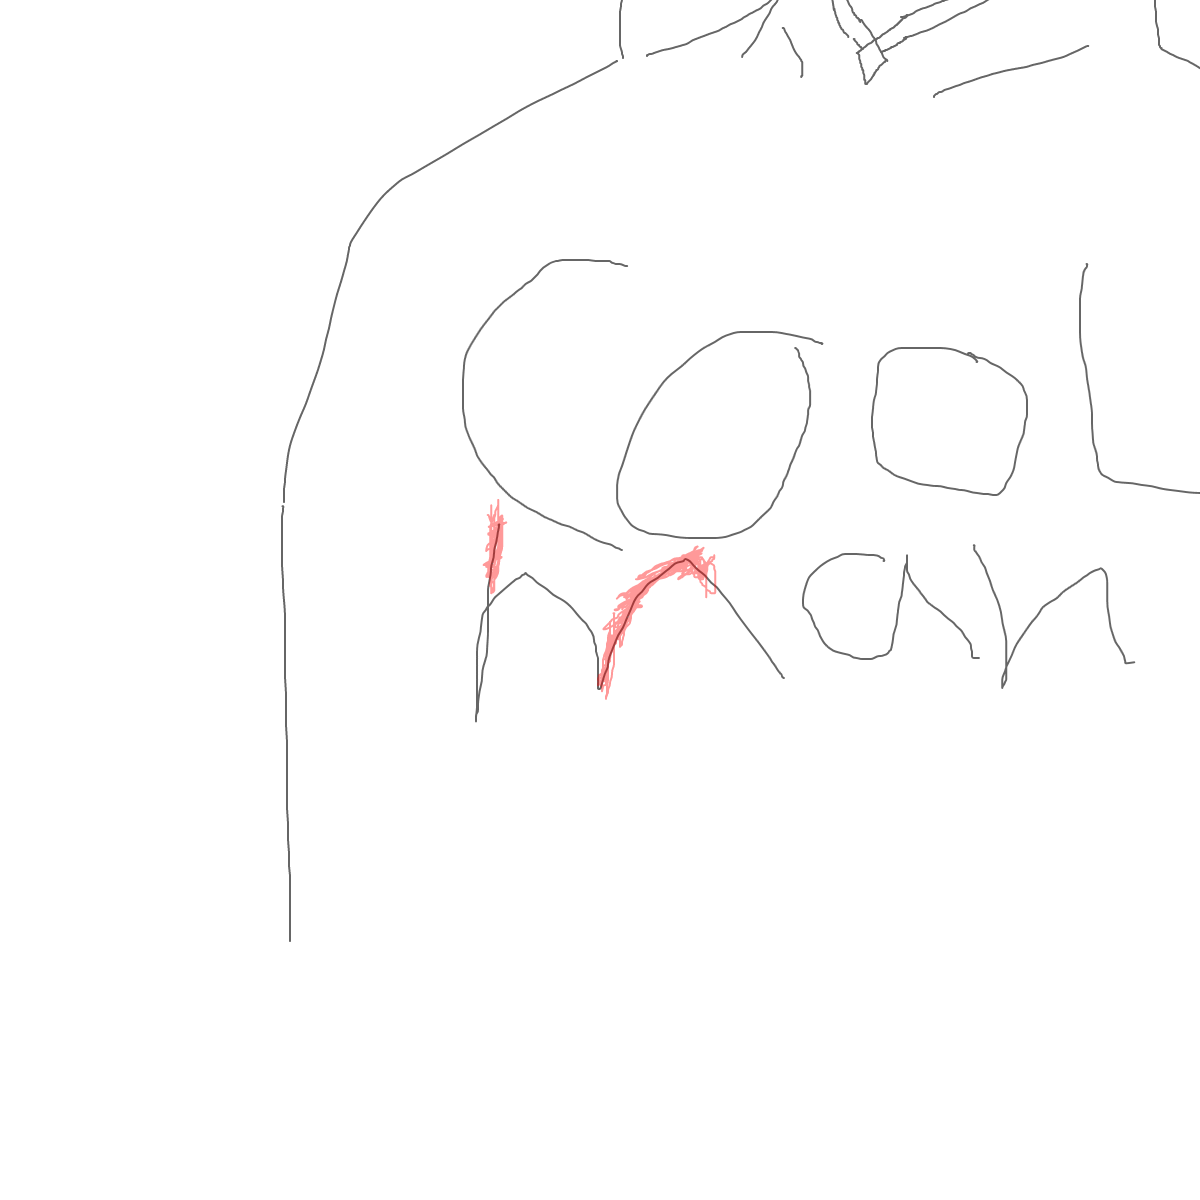 BAAAM drawing#23194 lat:52.4760284423828100lng: 13.4076299667358400